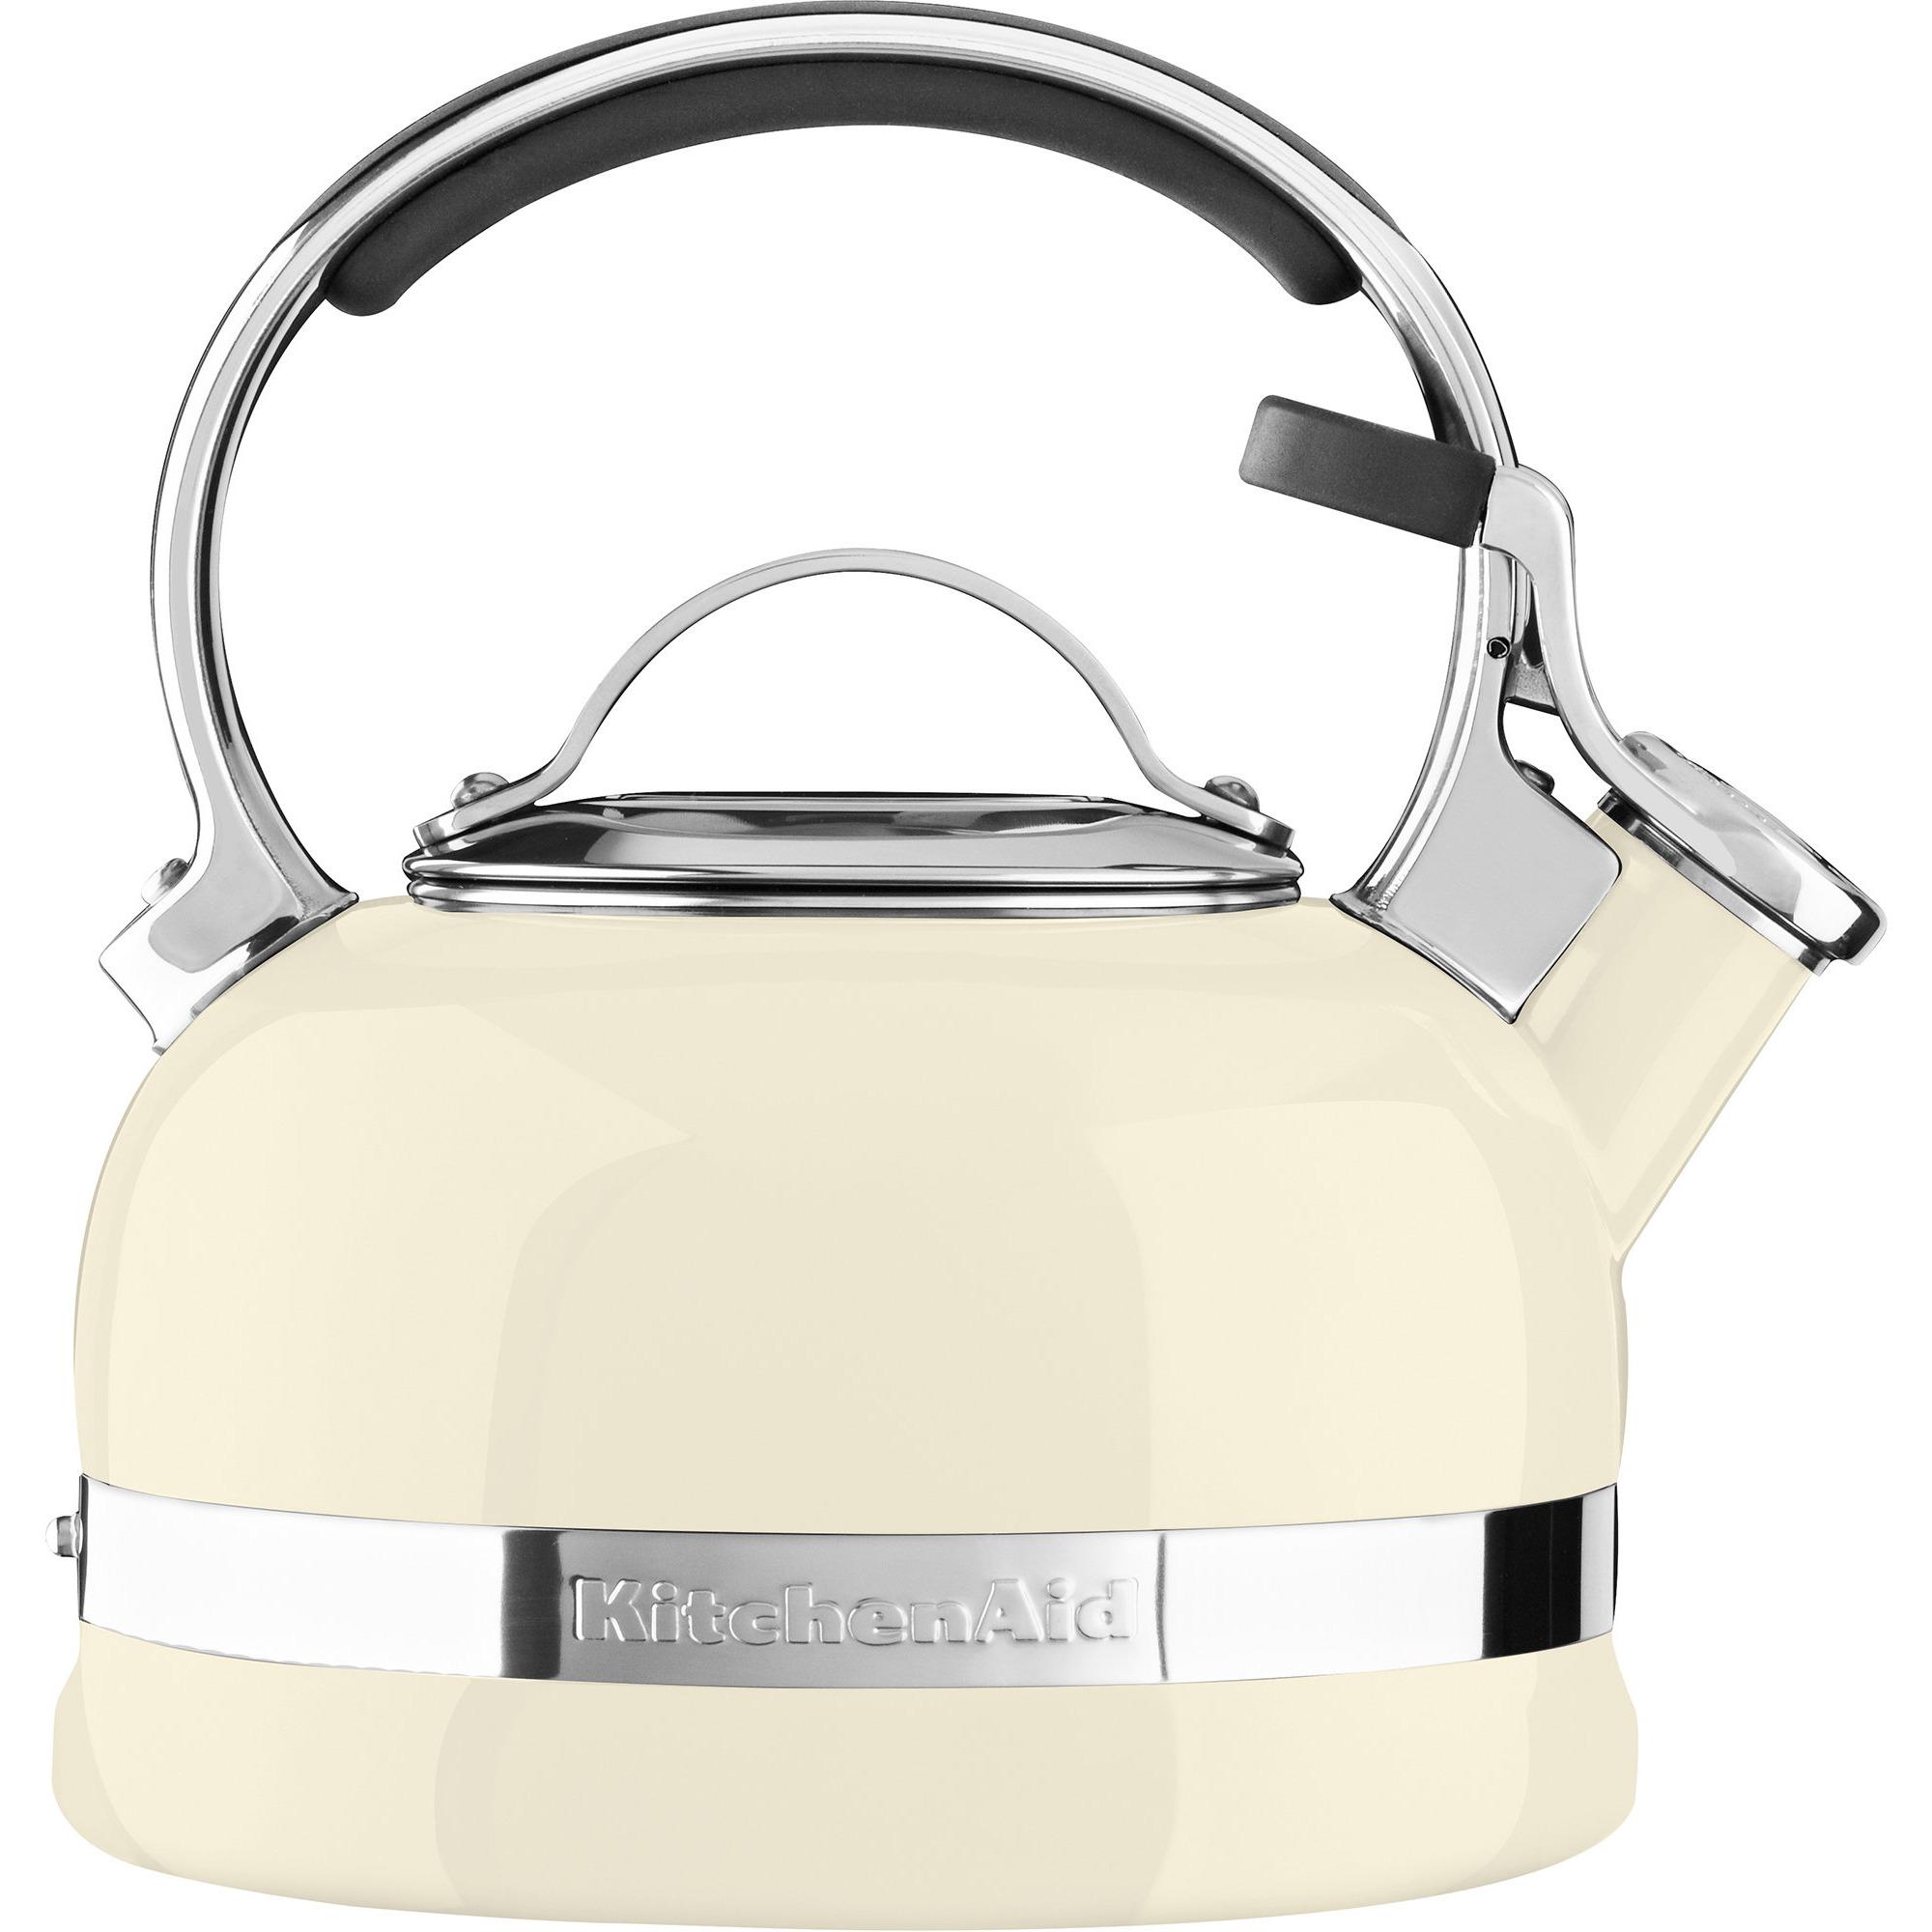 KitchenAid Pipkittel Creme 19 liter